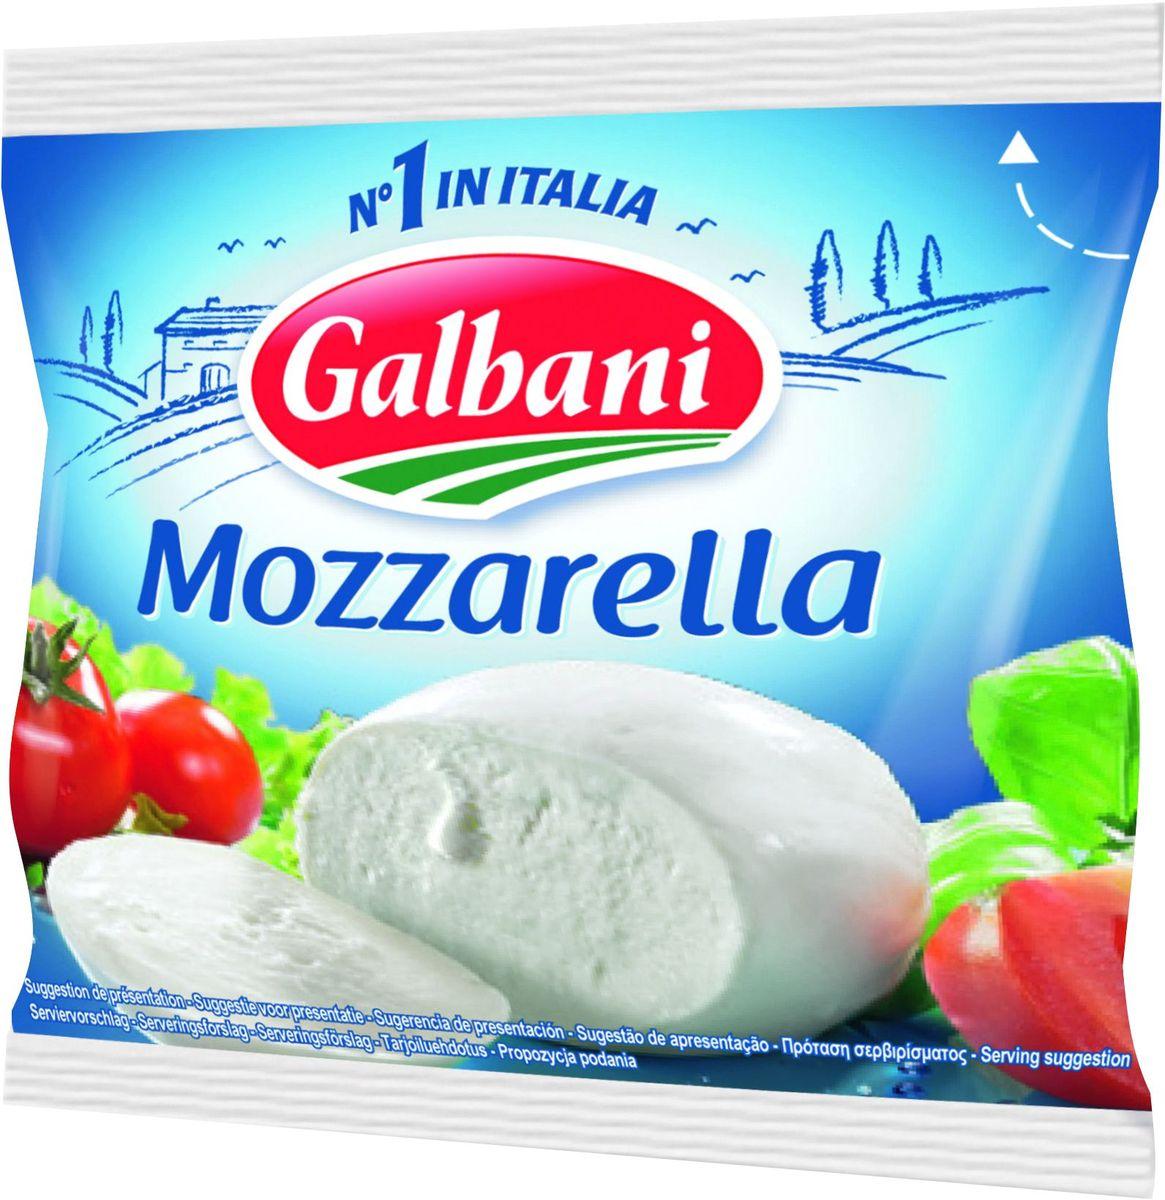 Galbani Сыр Моцарелла 45%, 125 г galbani сыр маскарпоне 80% 250 г